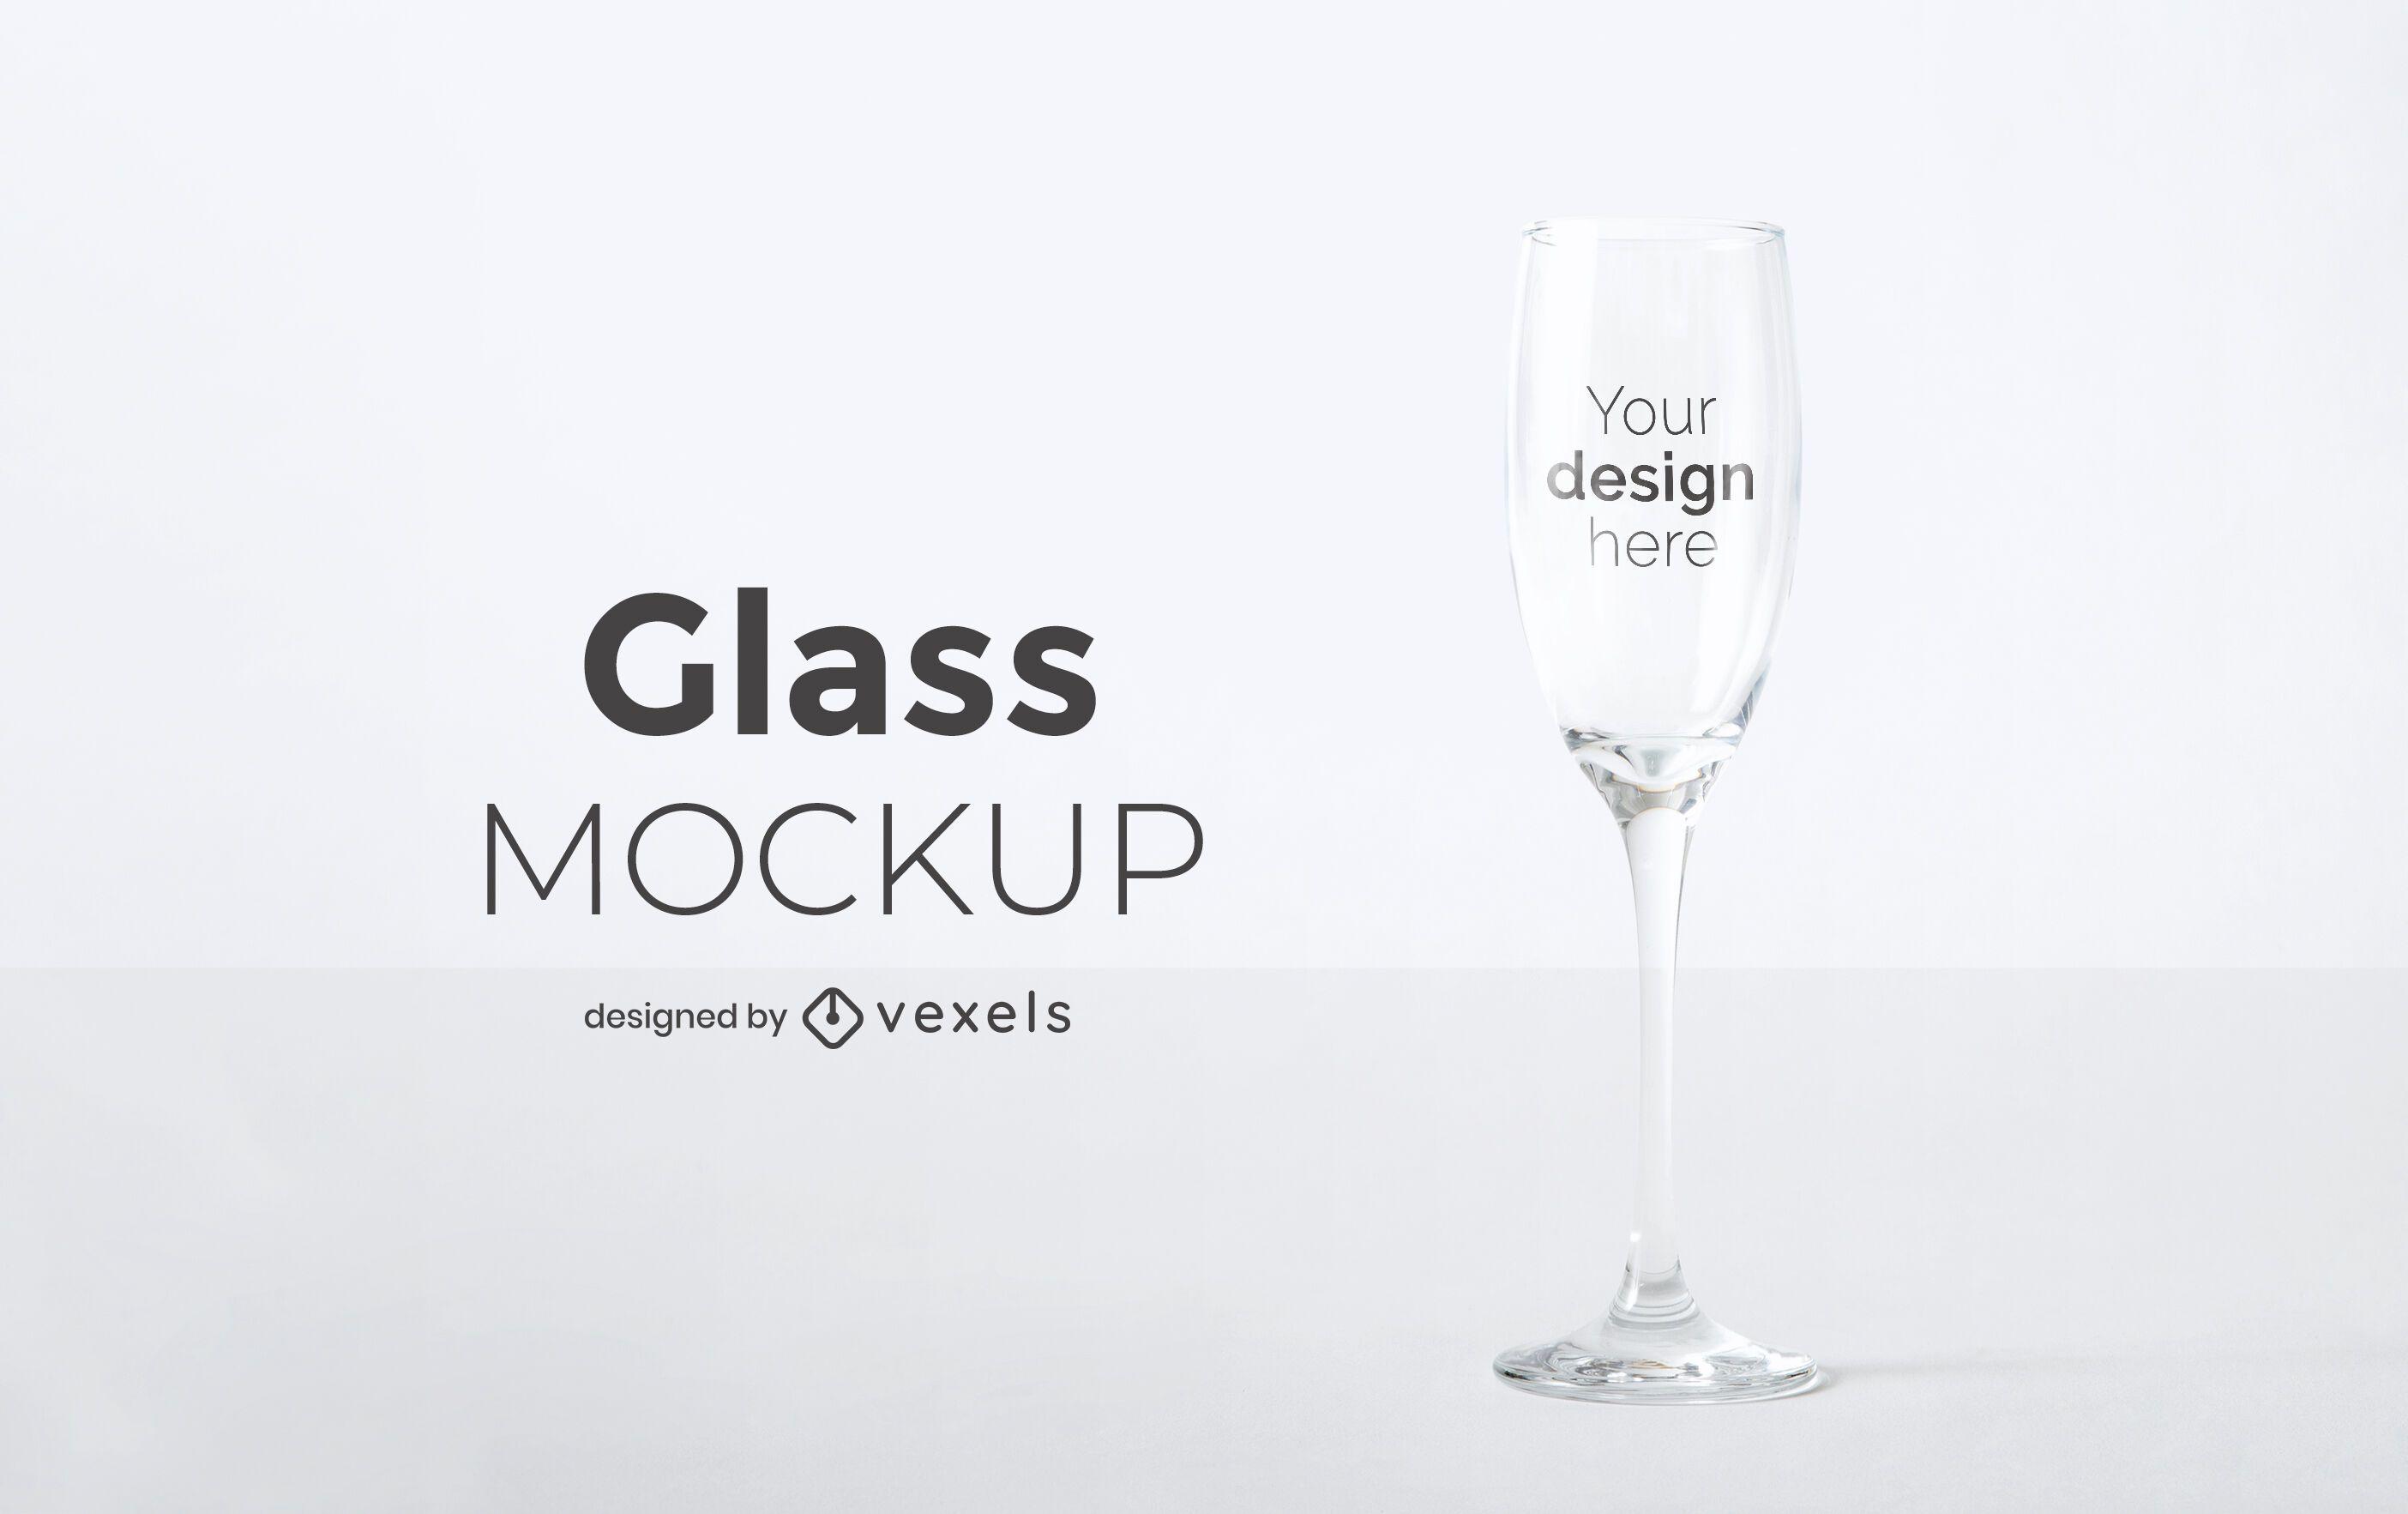 Champagne glass mockup design